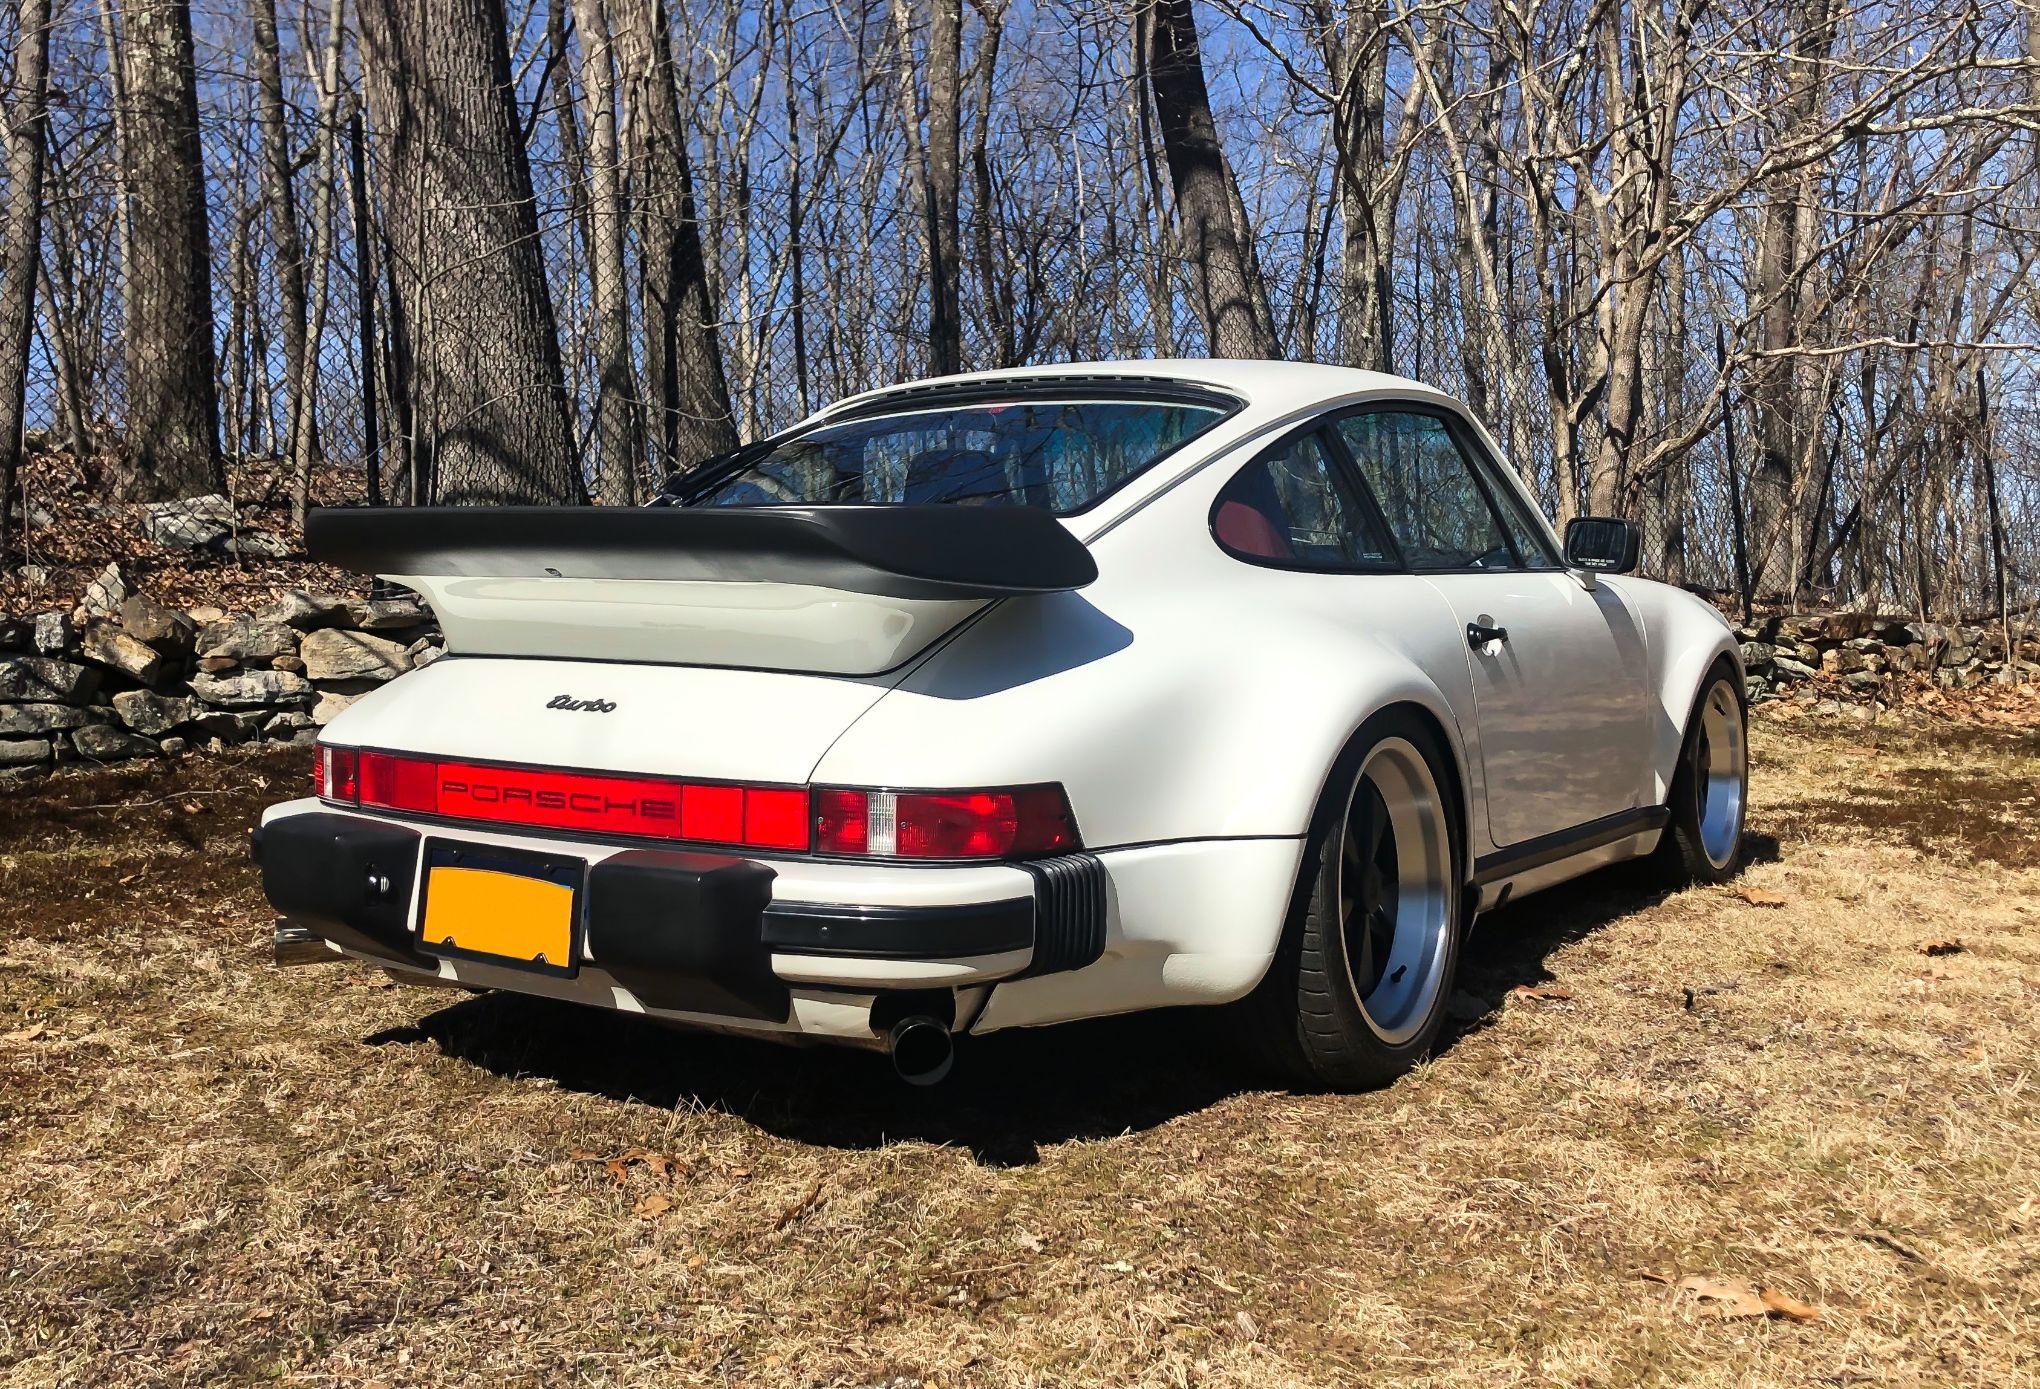 41k Mile 1989 Porsche 930 Turbo G50 50 5 Speed Pcarmarket